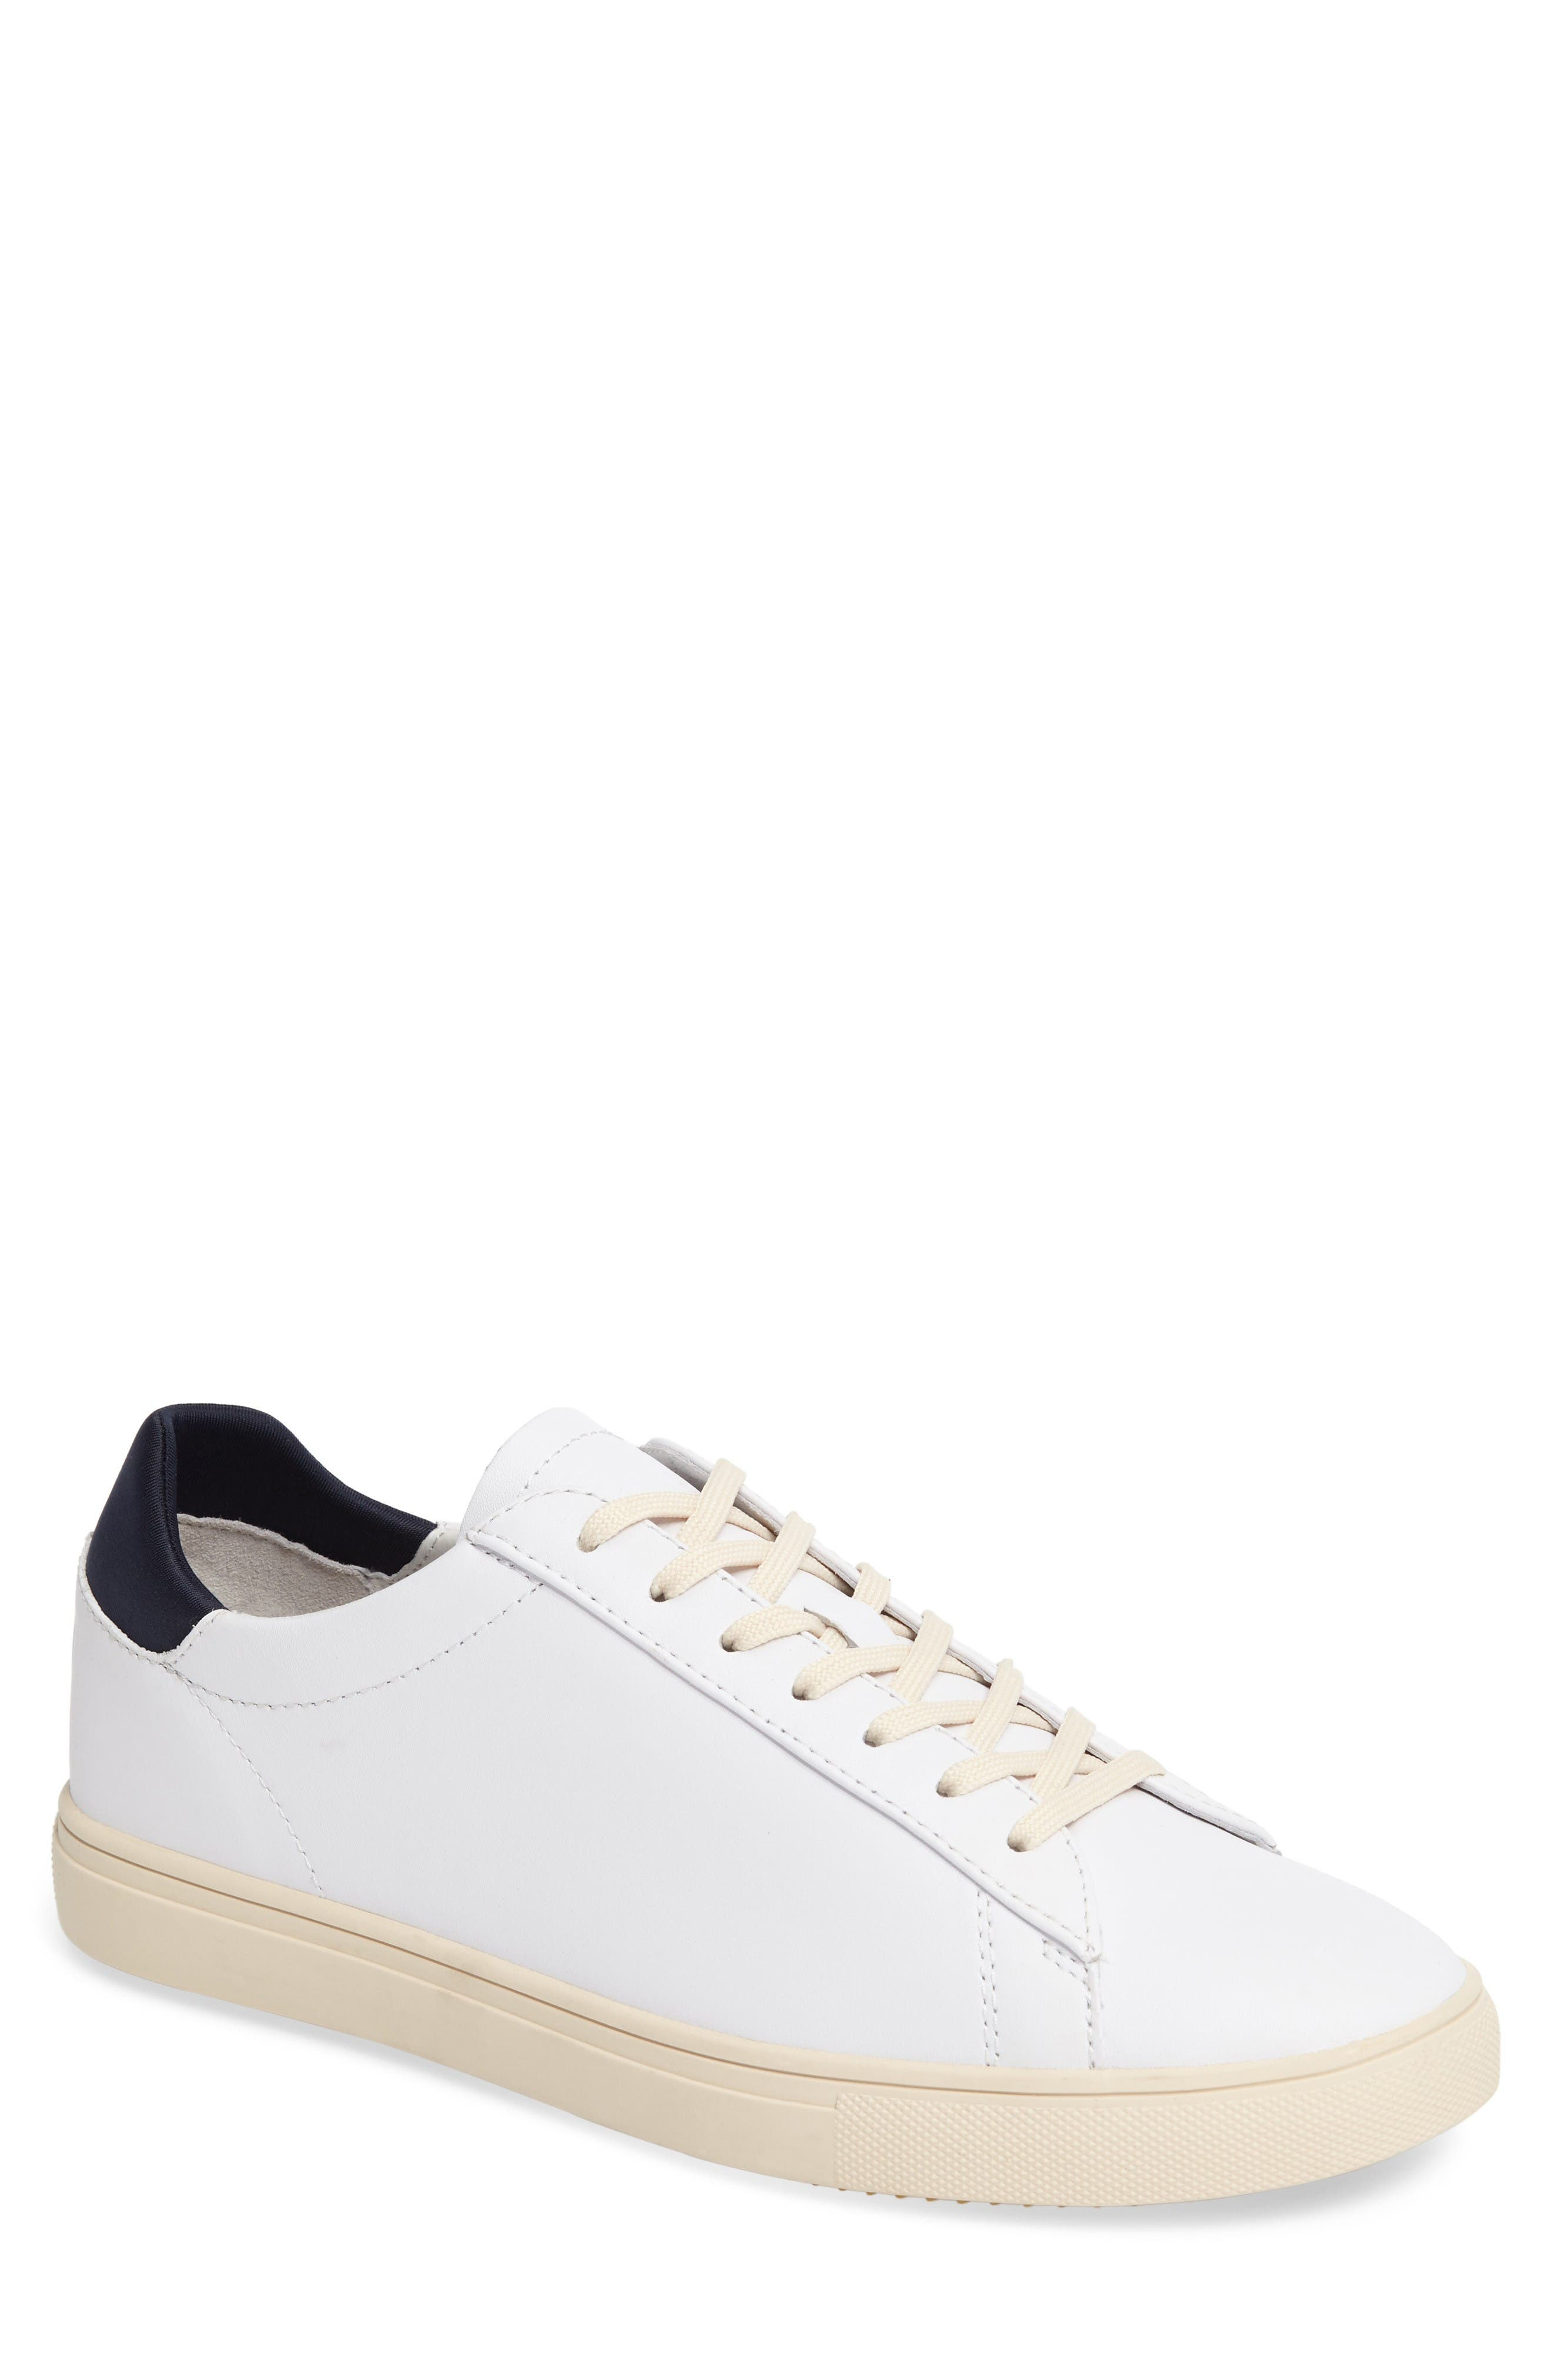 Main Image - Clae 'Bradley' Sneaker (Men)